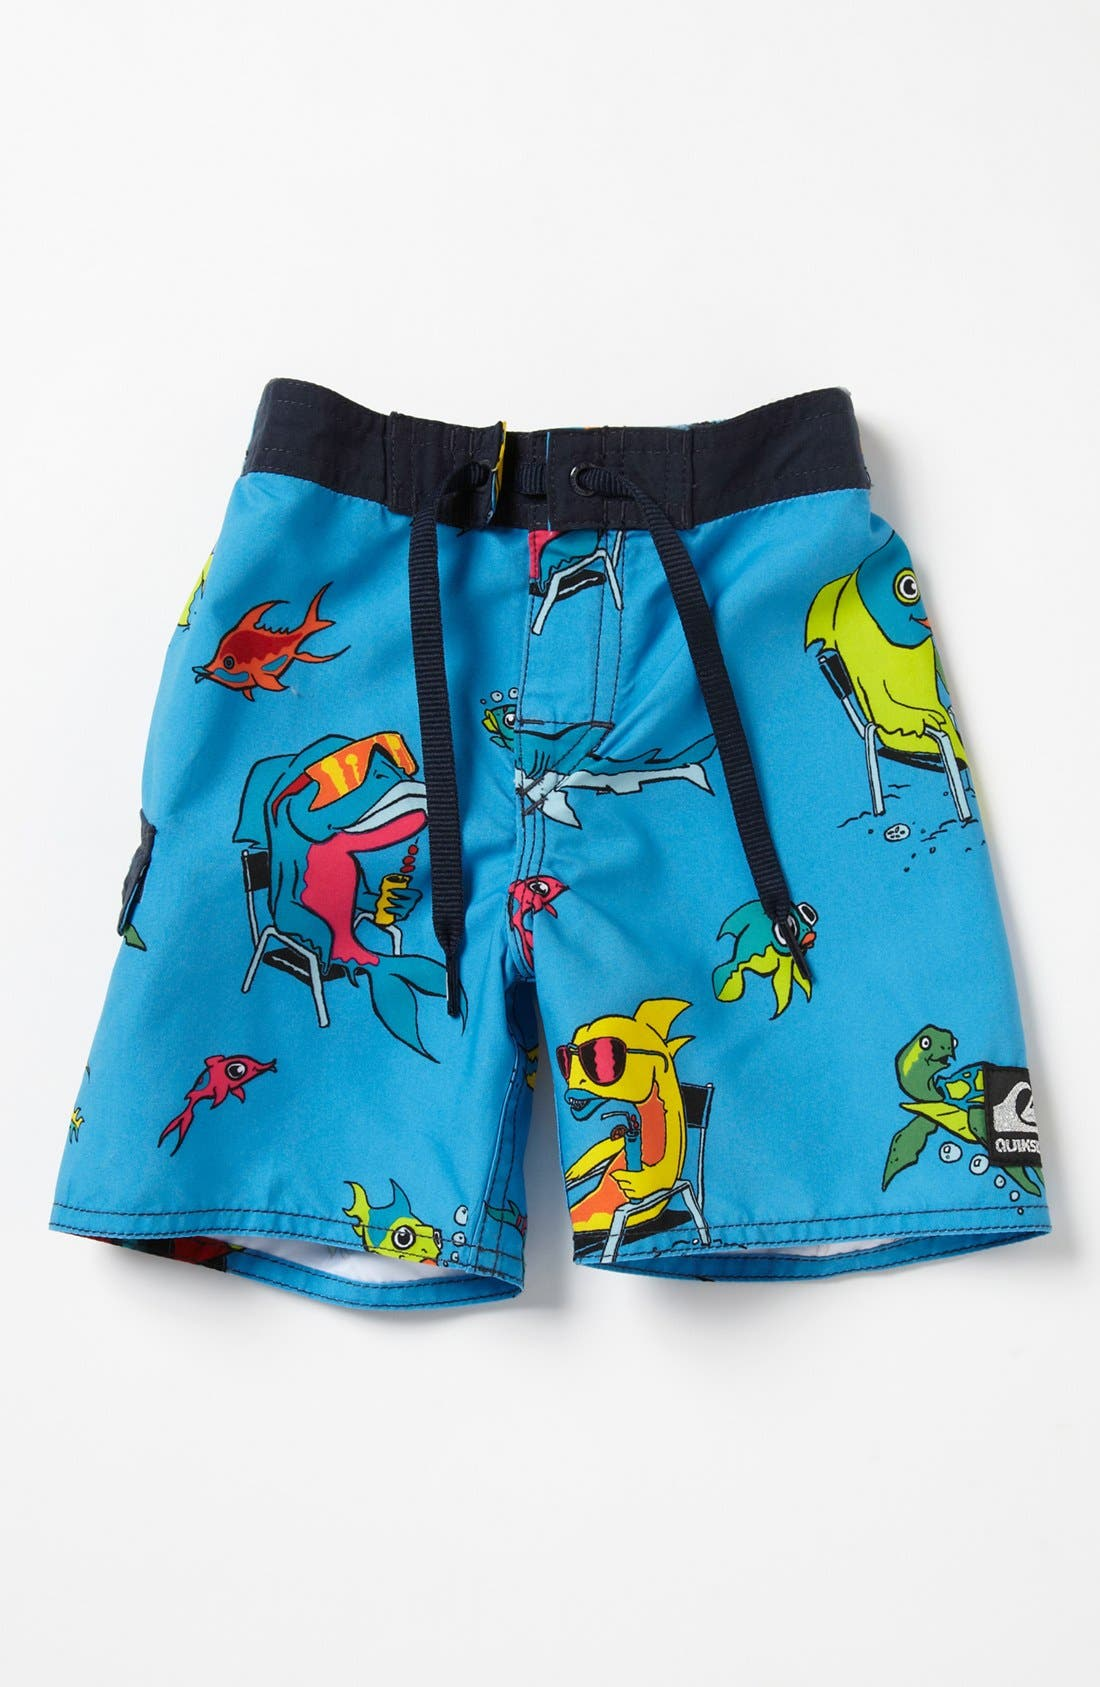 Alternate Image 1 Selected - Quiksilver 'Fish Tacoz' Board Shorts (Baby Boys)